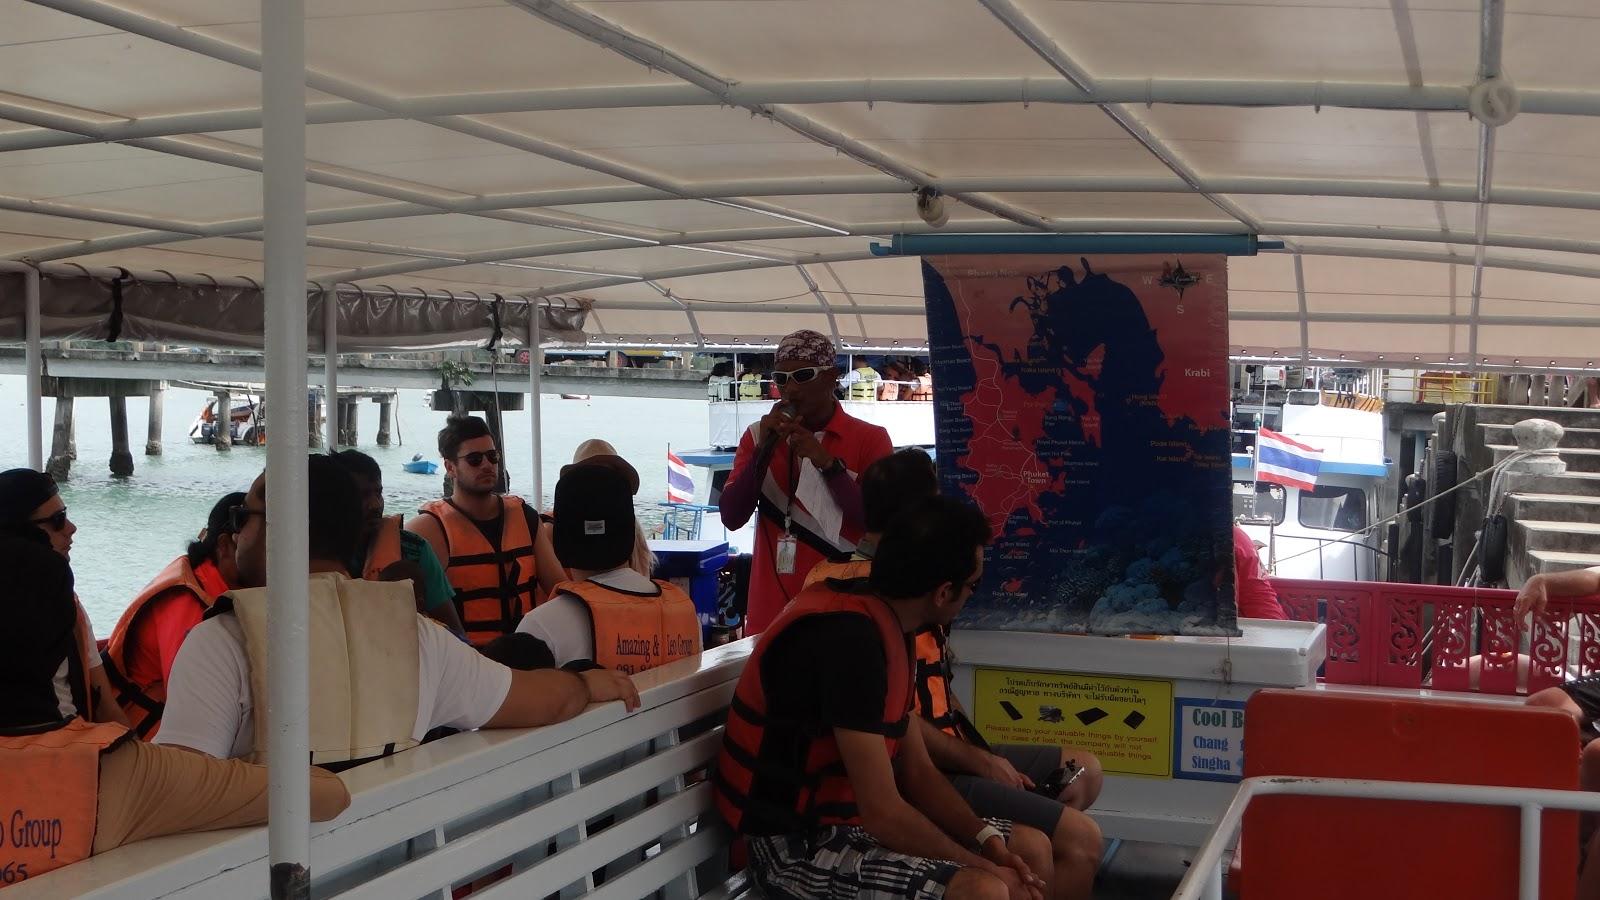 Days At Phuket Island - Part 2